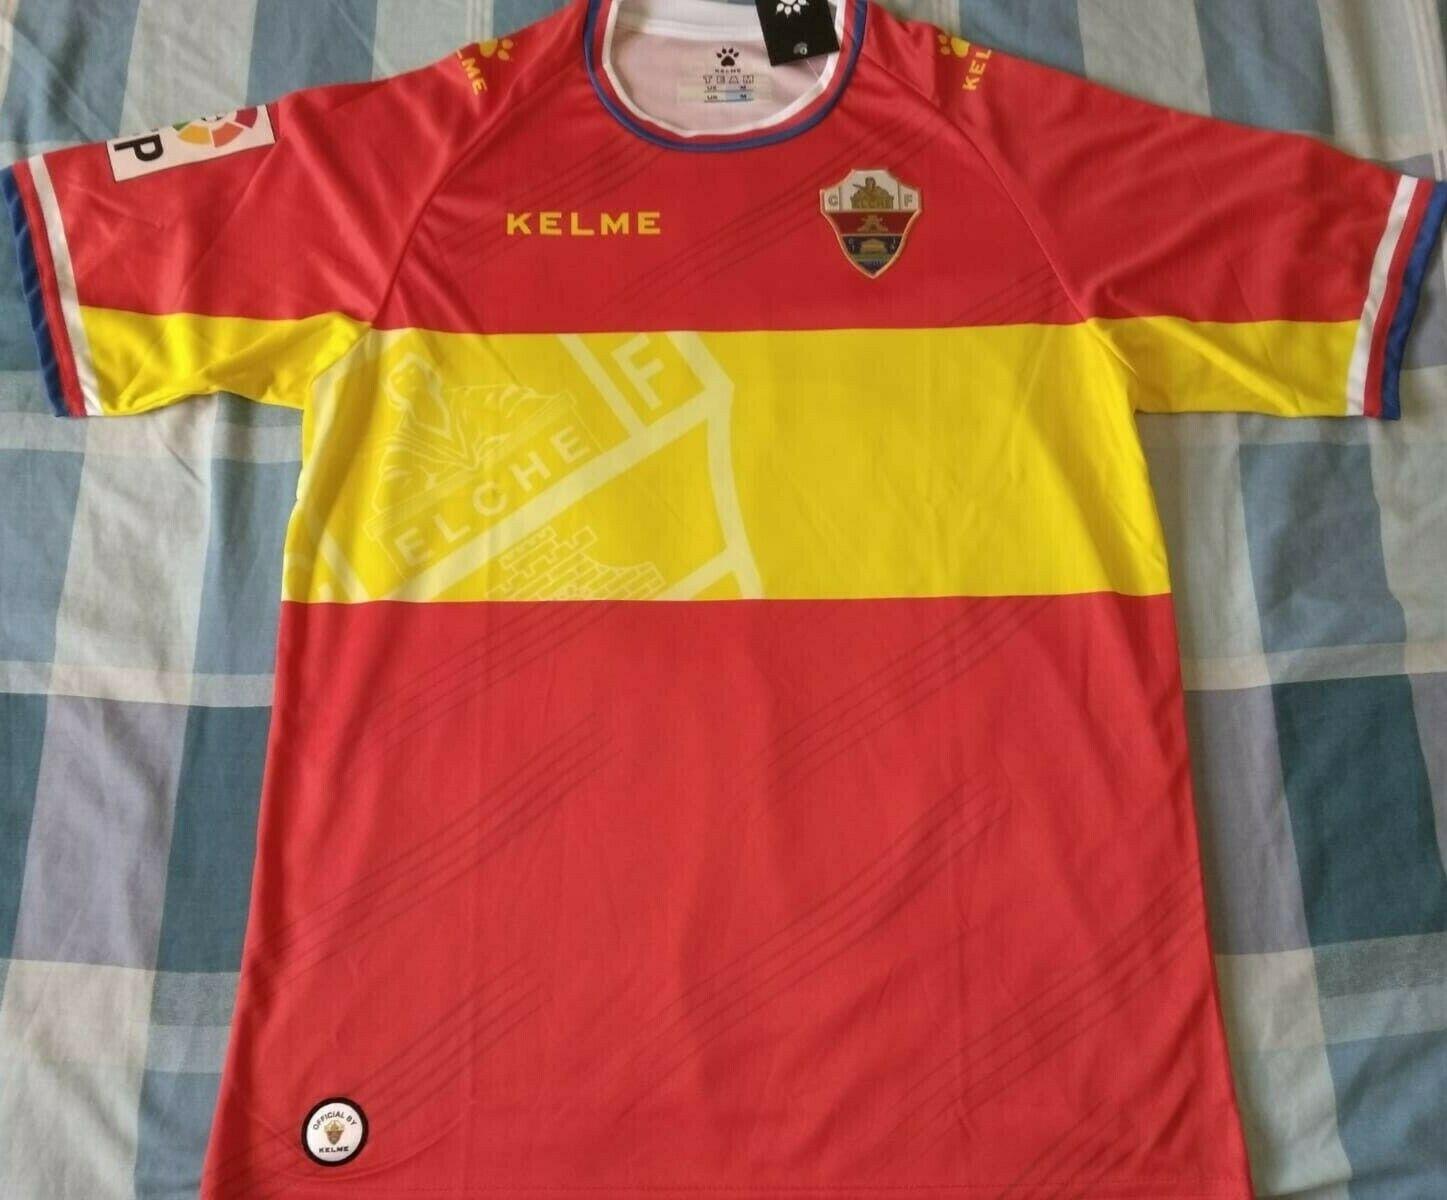 Camiseta Shirt Maillot ELCHE Kelme away Season 2015 Diuominiione M nuovo wtags